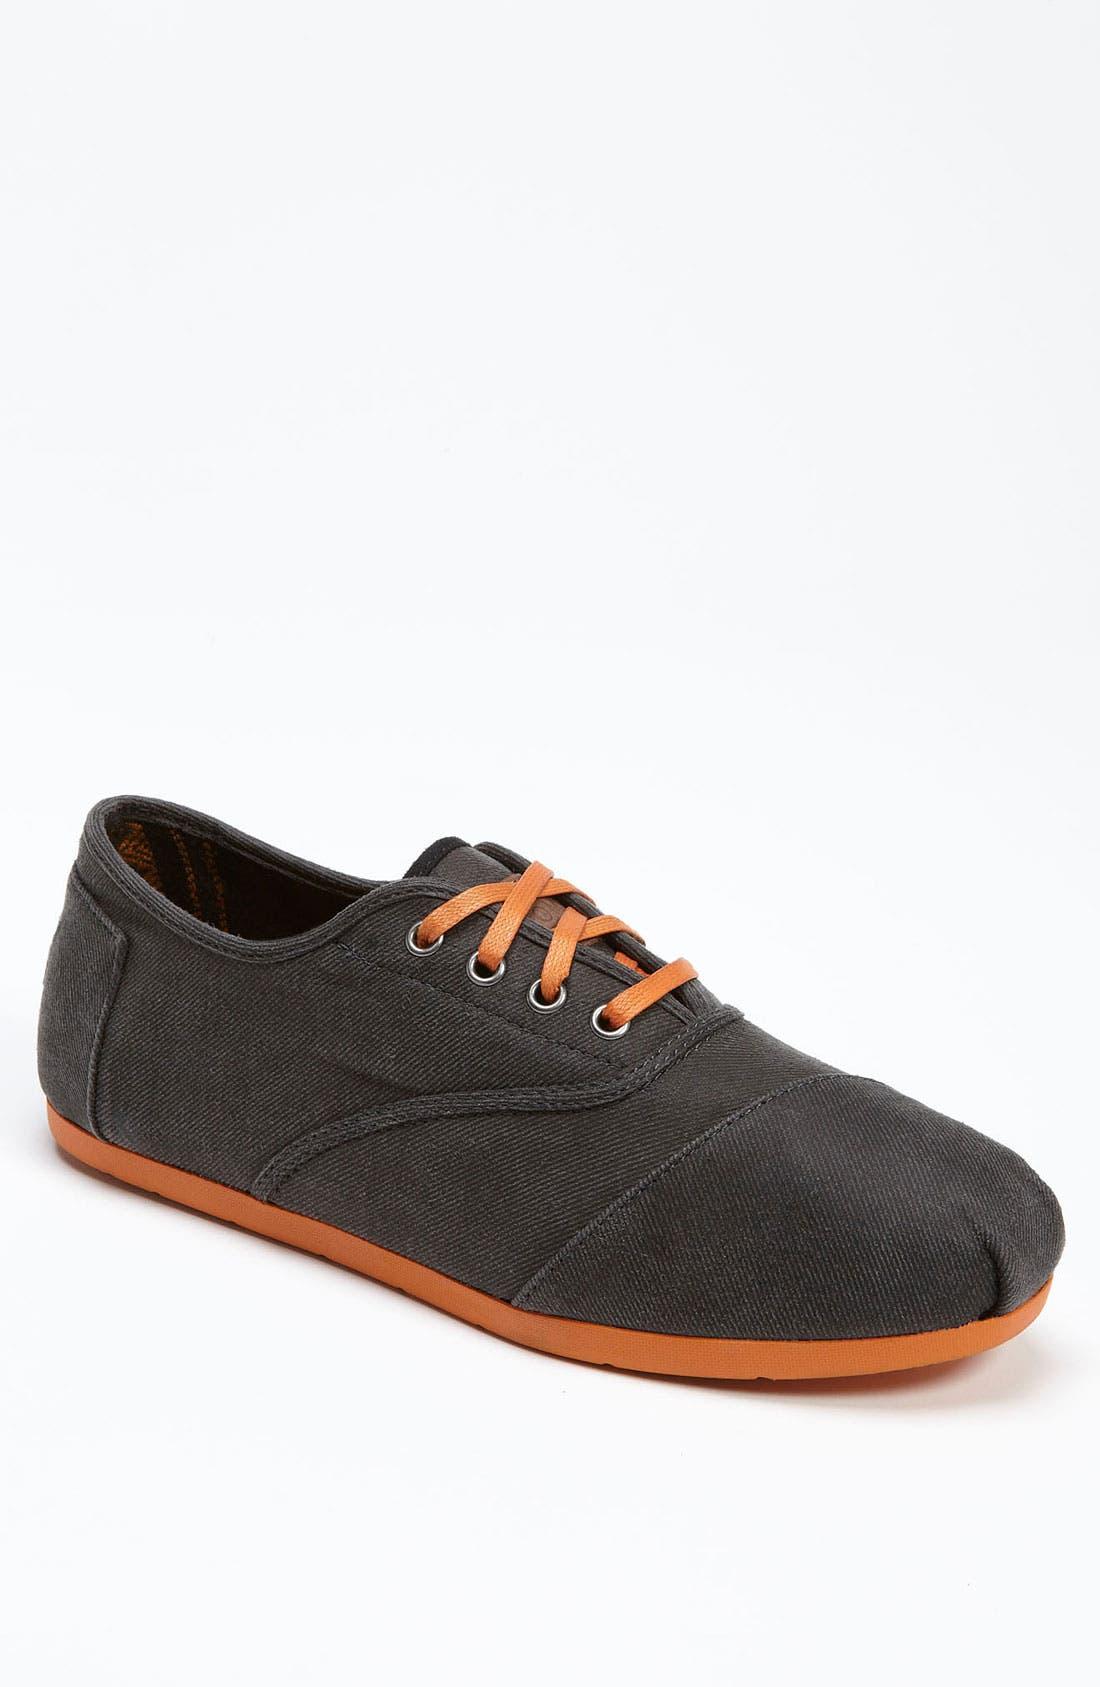 Alternate Image 1 Selected - TOMS 'Cordones' Twill Sneaker (Men) (Nordstrom Exclusive)